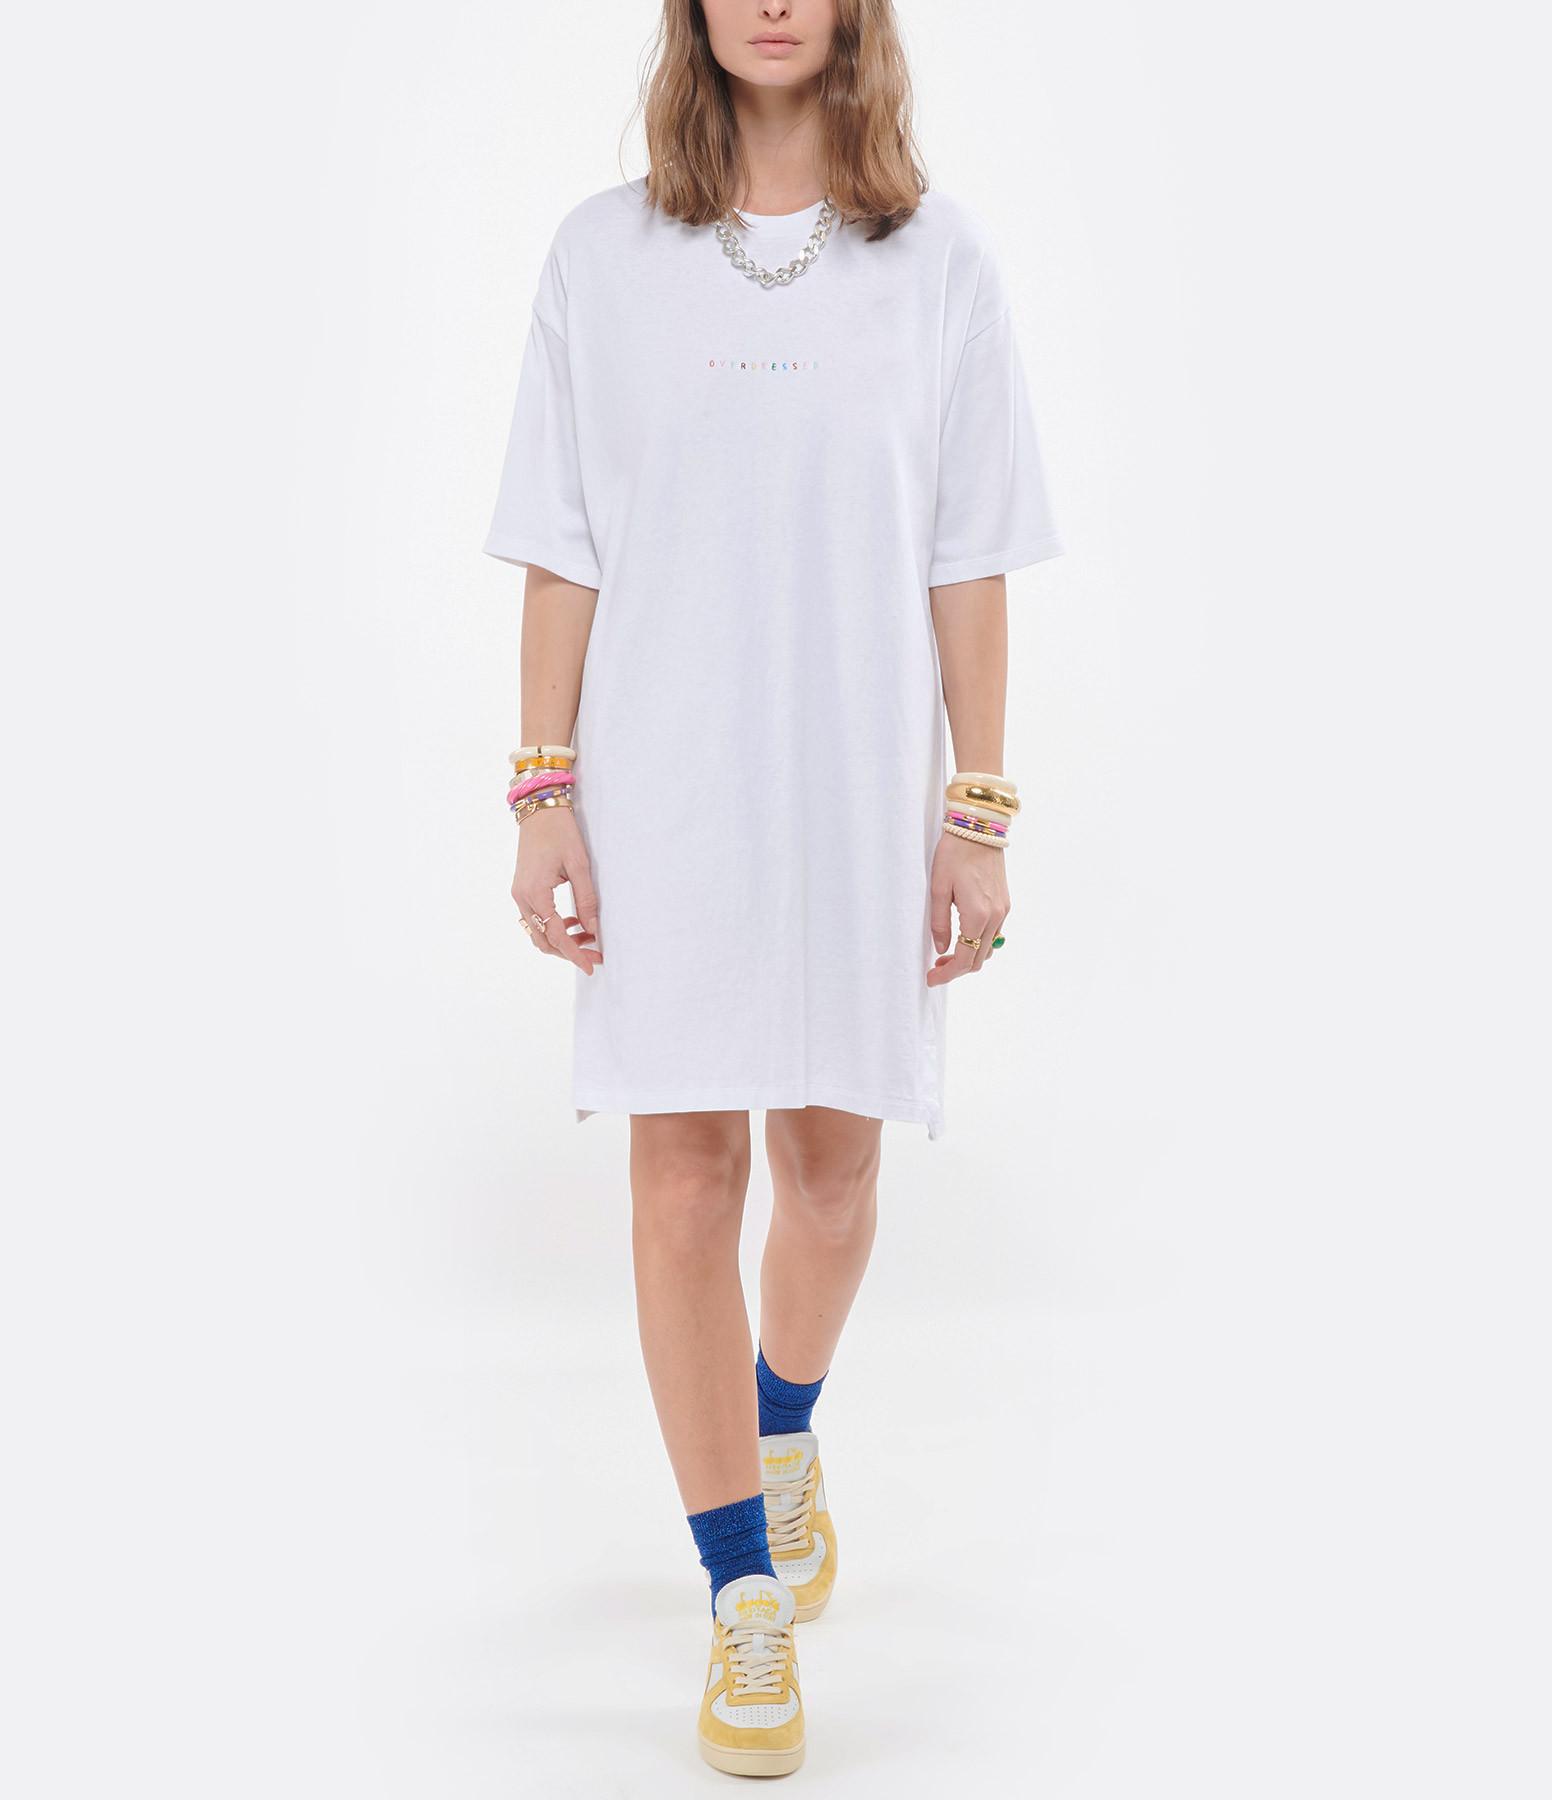 ISABEL MARANT - Chaussettes Slazia Bleu